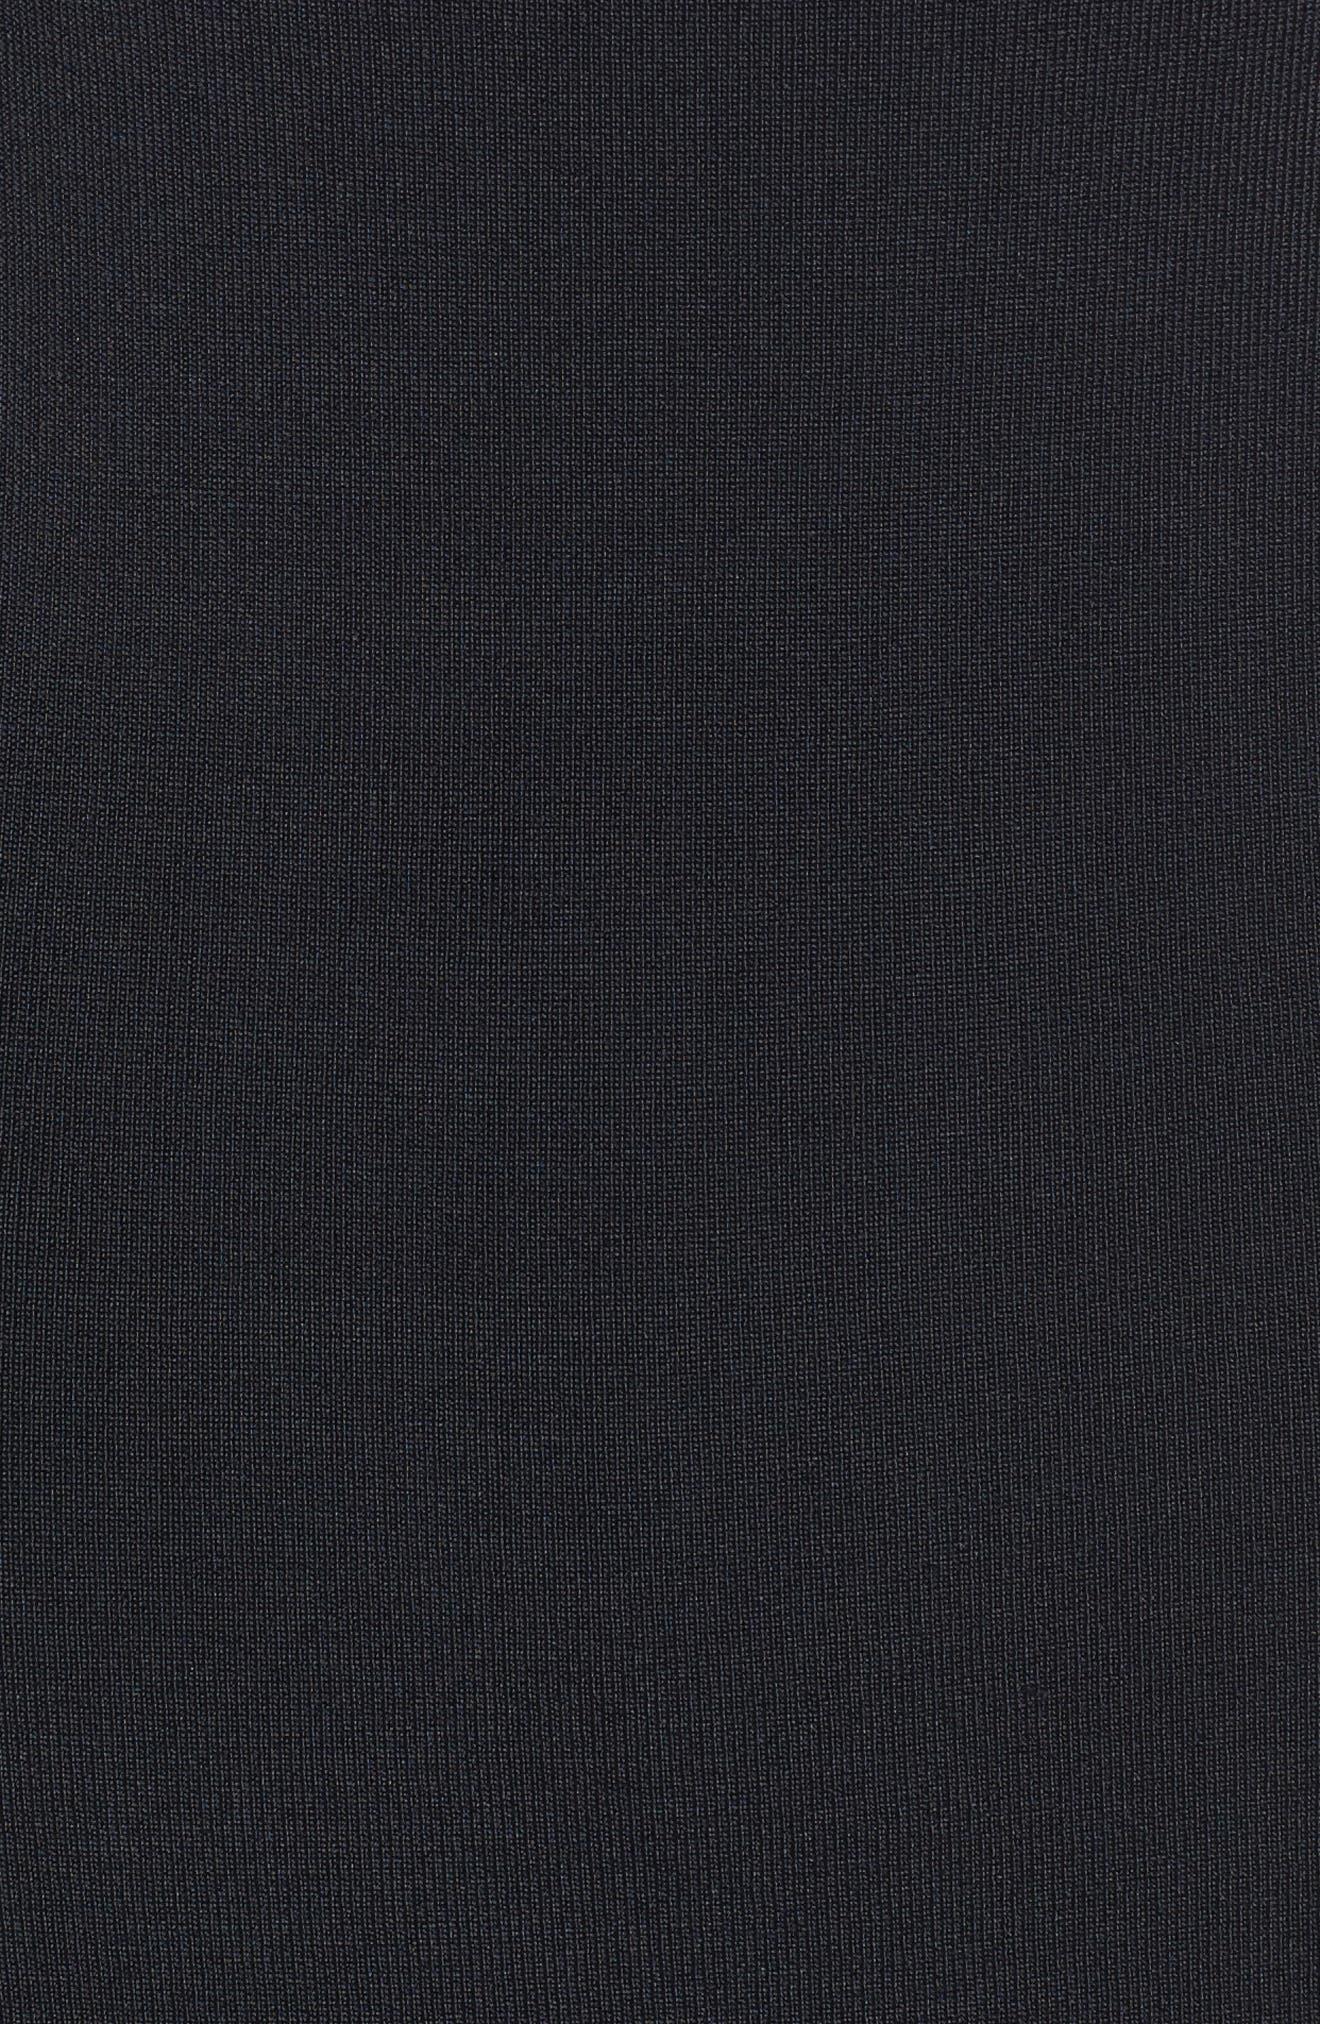 Bateau Neck Sweater Dress,                             Alternate thumbnail 5, color,                             001